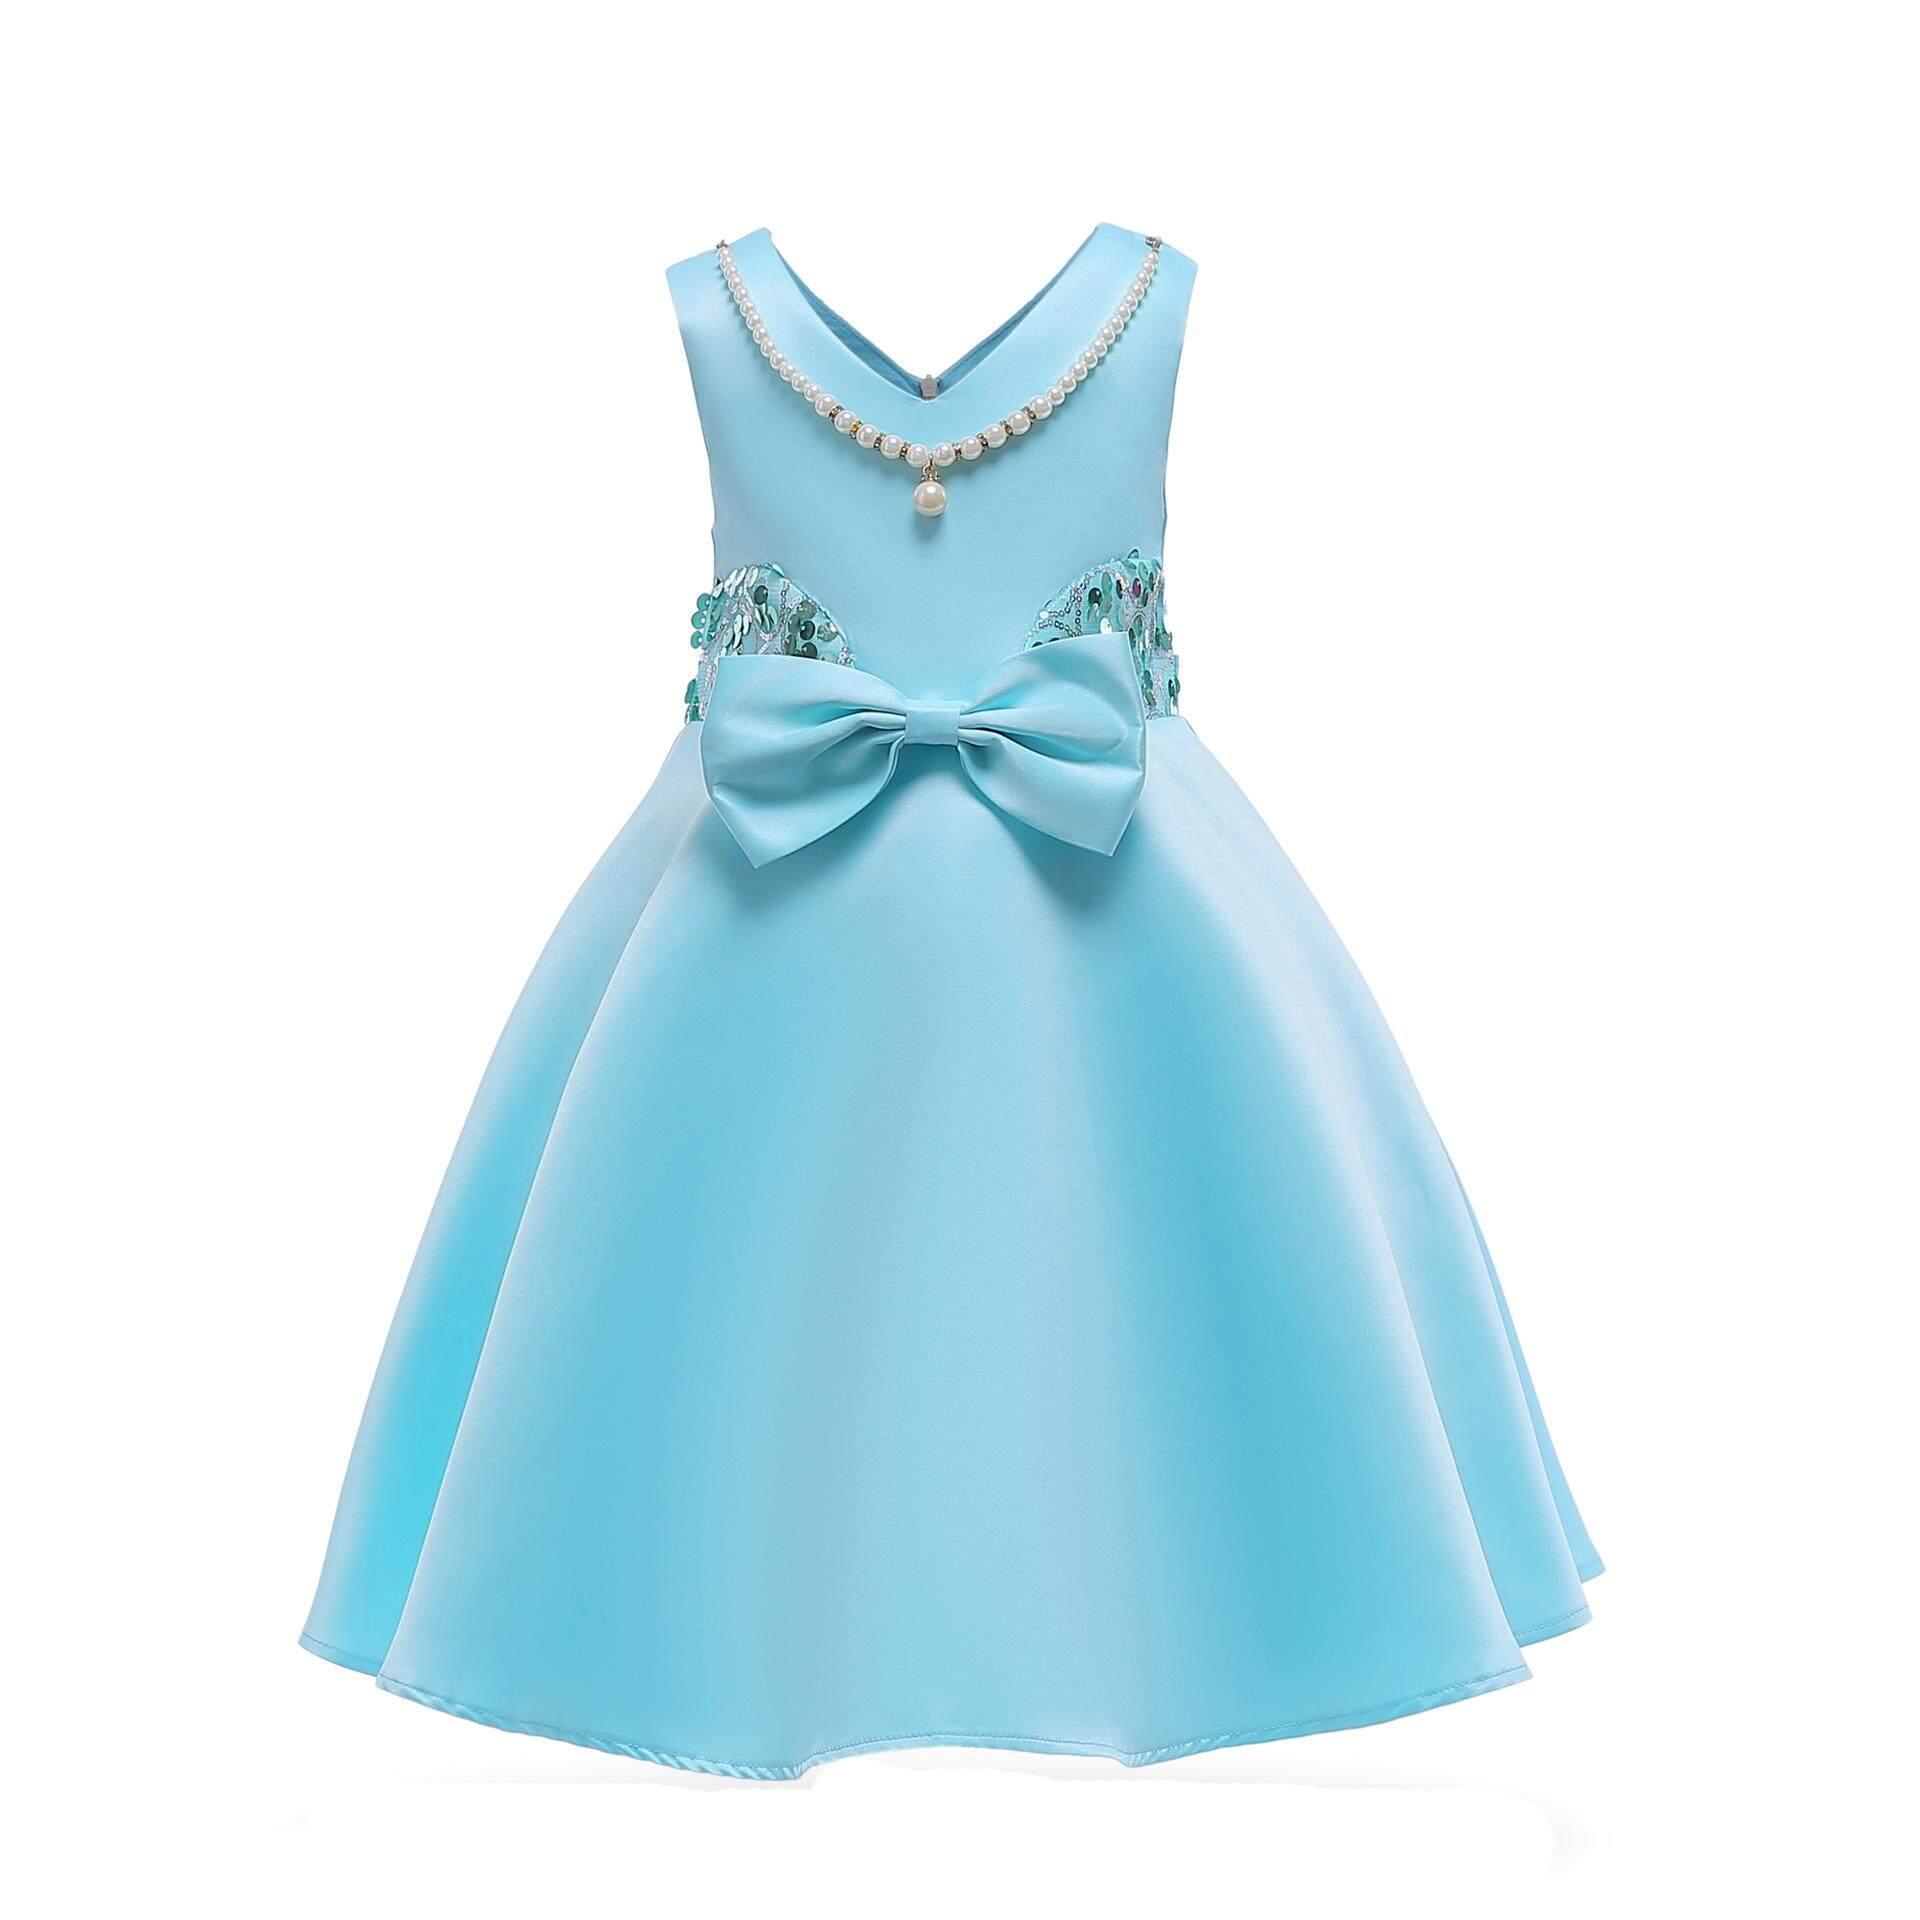 Senno Kids Clothing Store